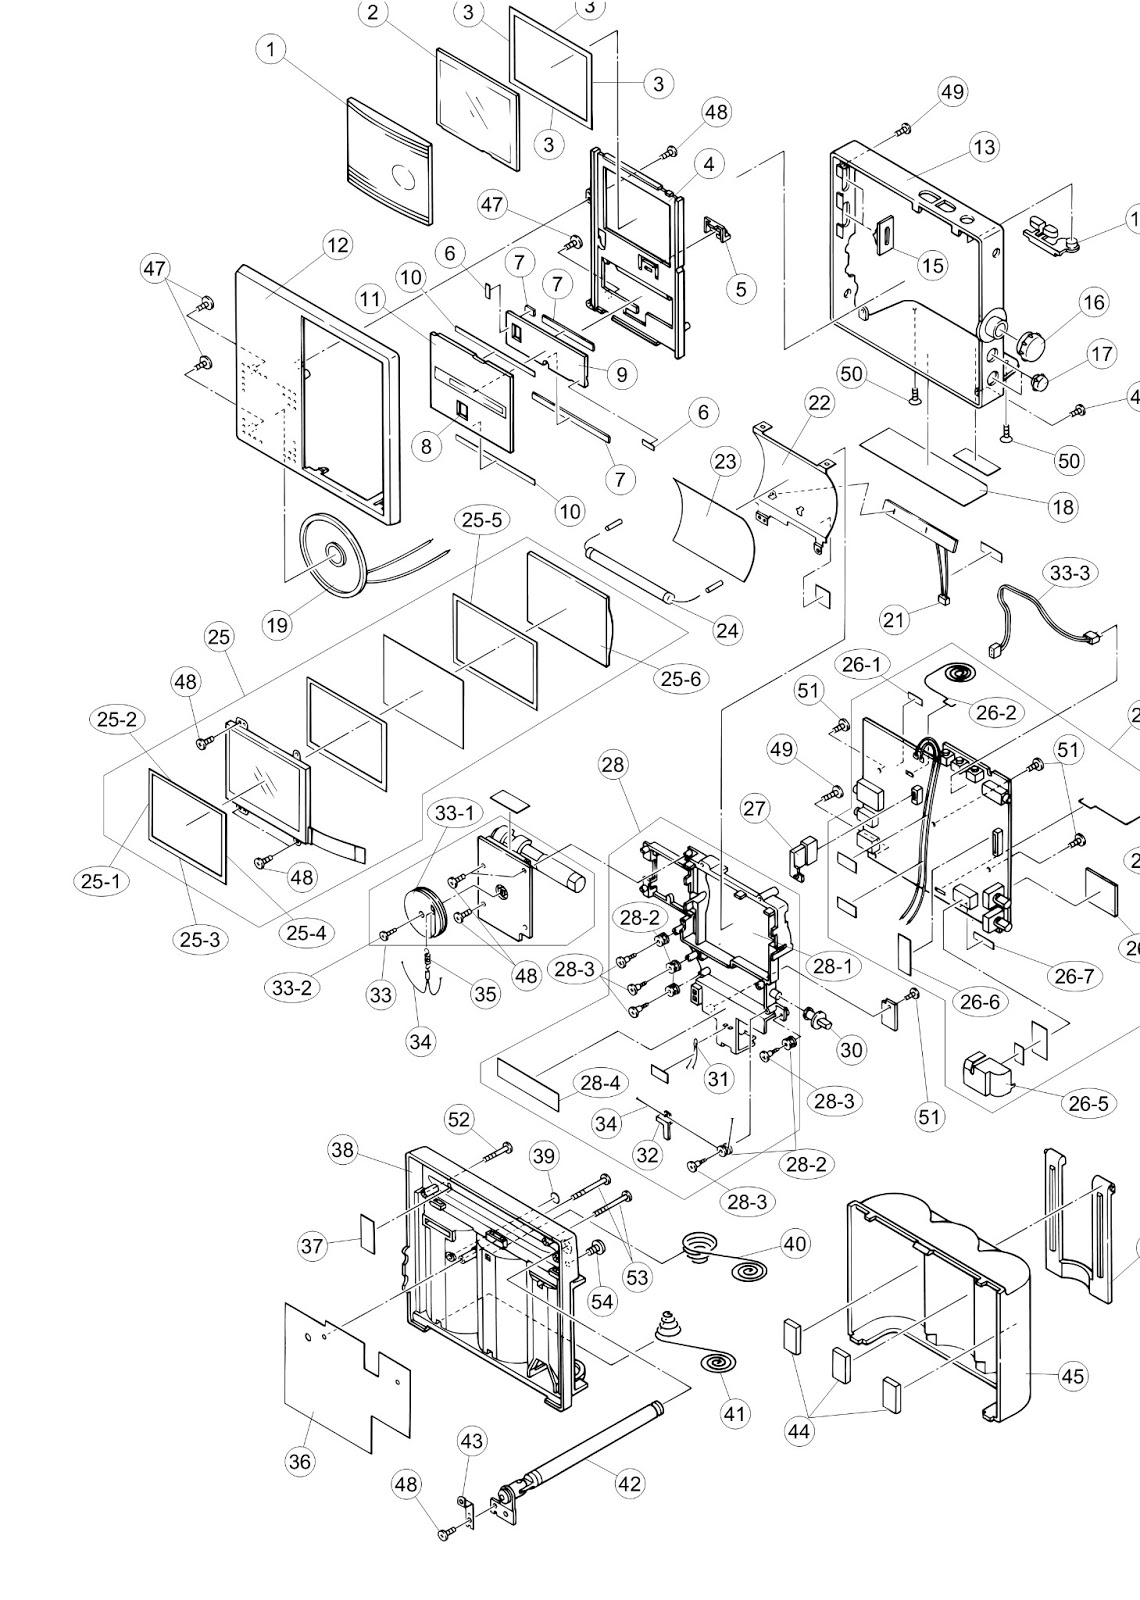 Master Electronics Repair    Casio Ev-2500b Kx618